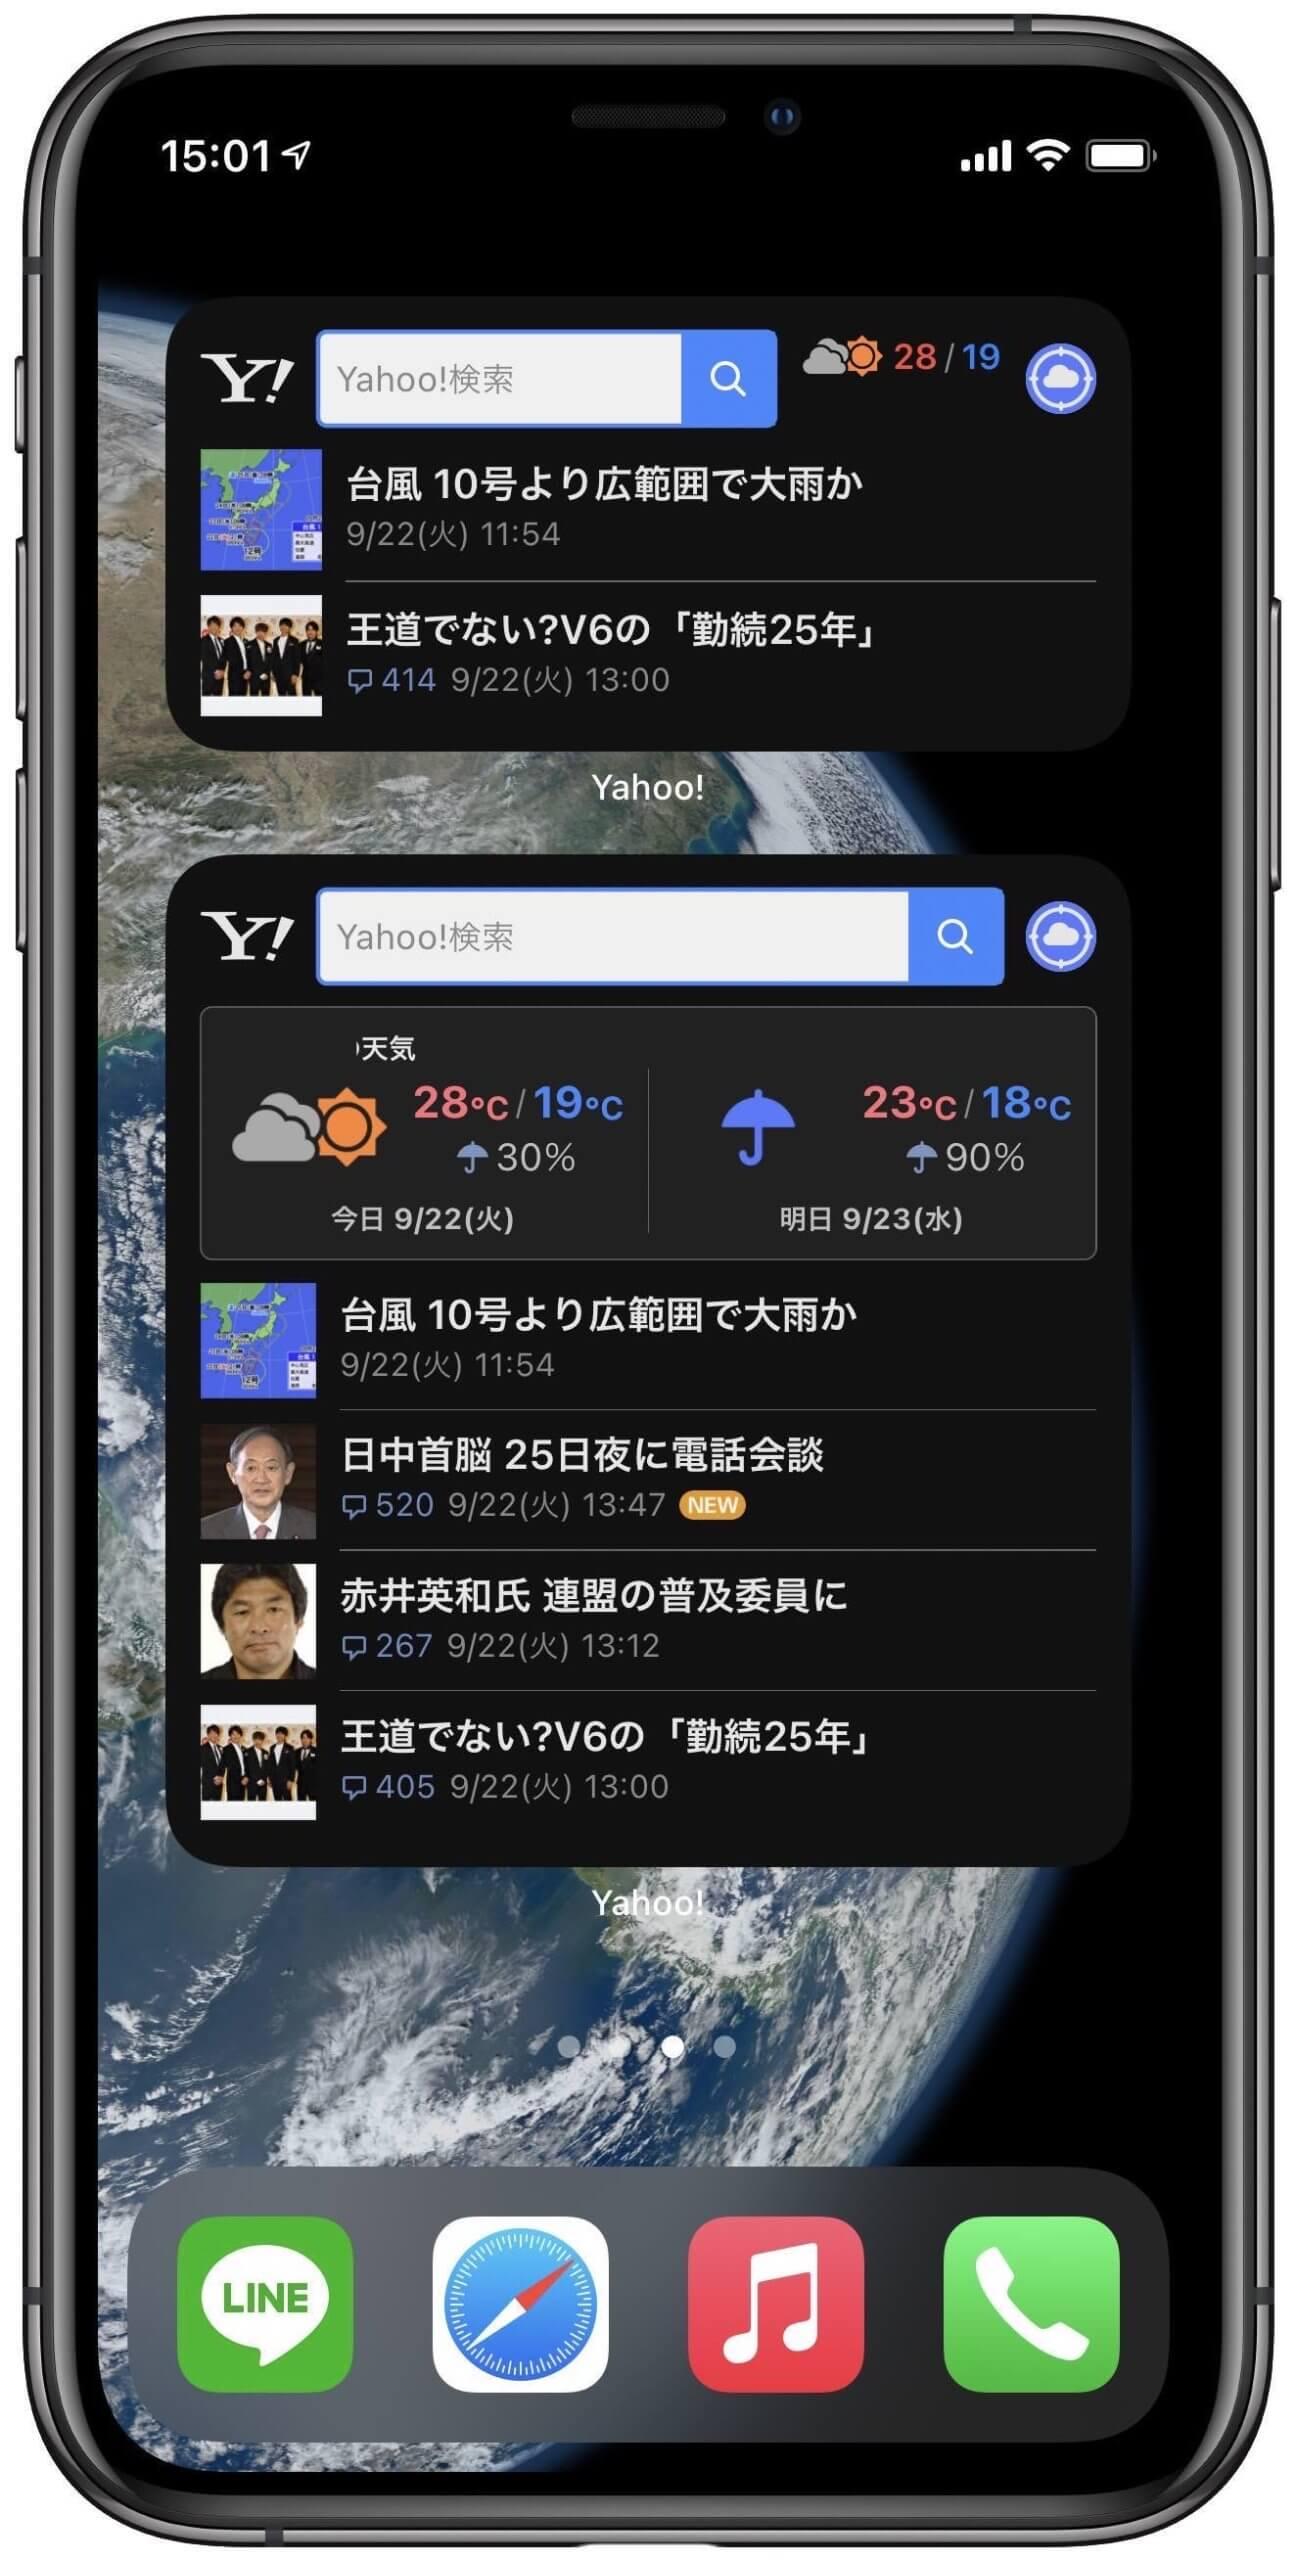 Yahoo JAPANWidget